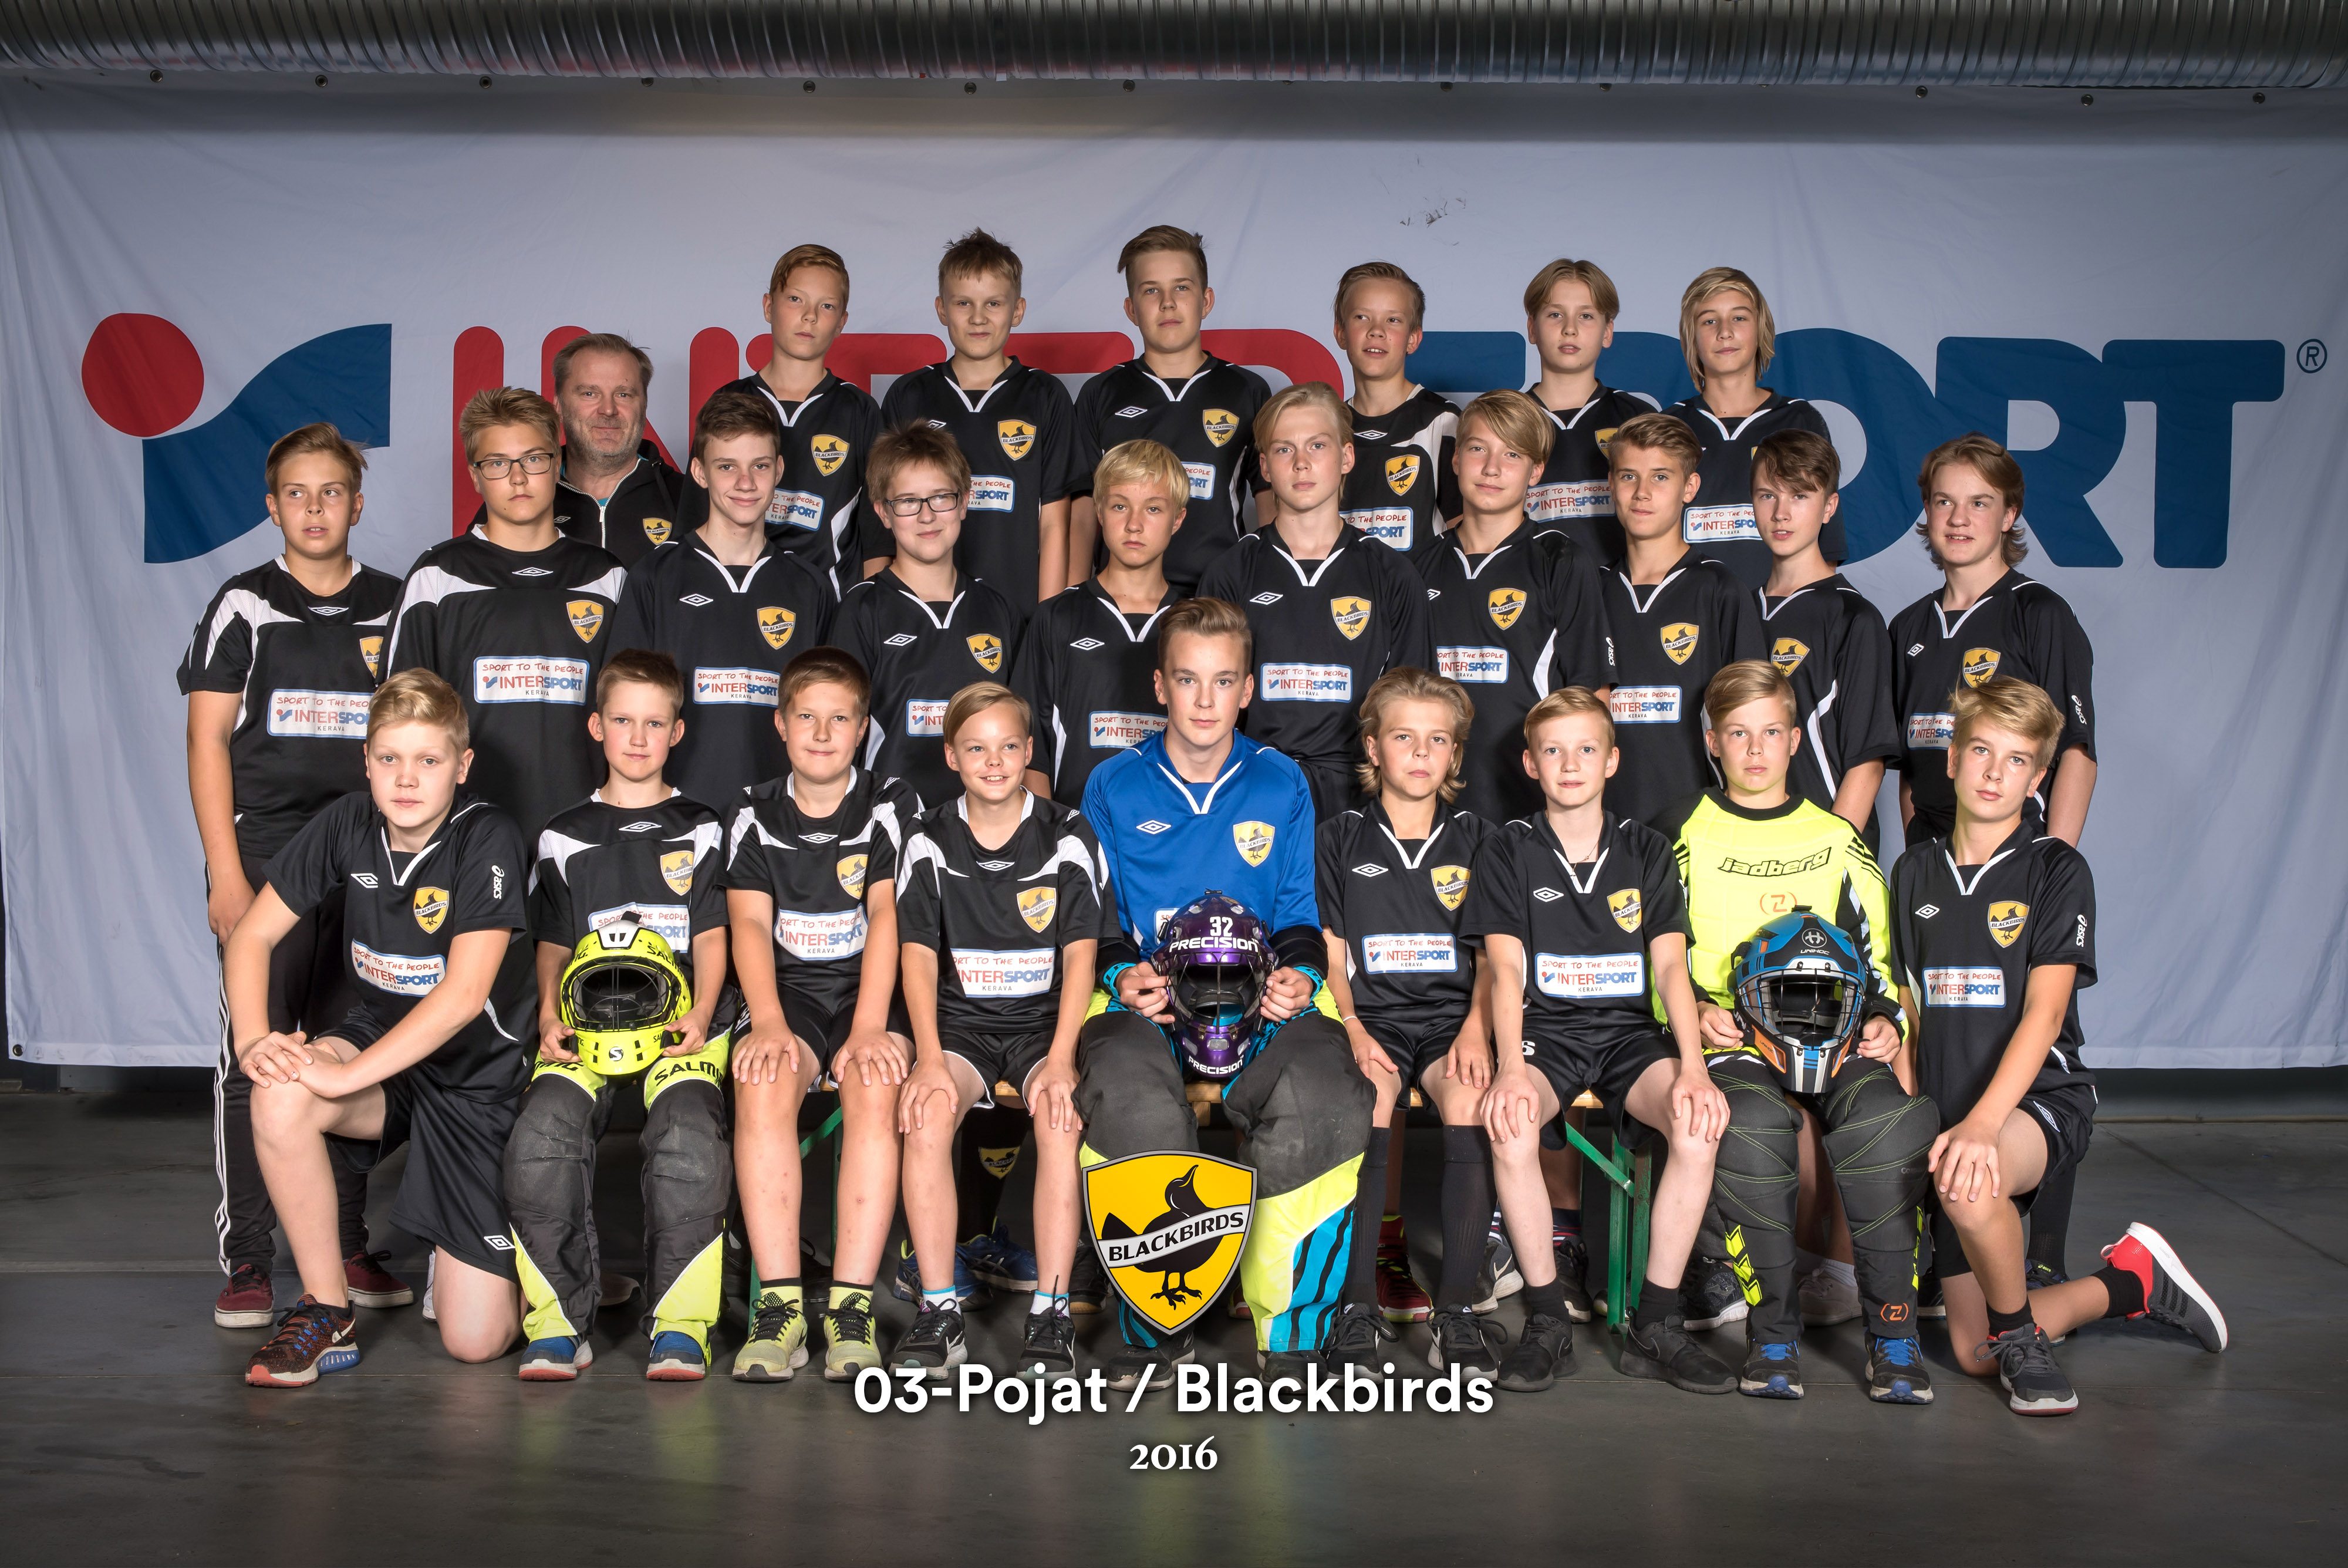 Blackbirds Salibandy